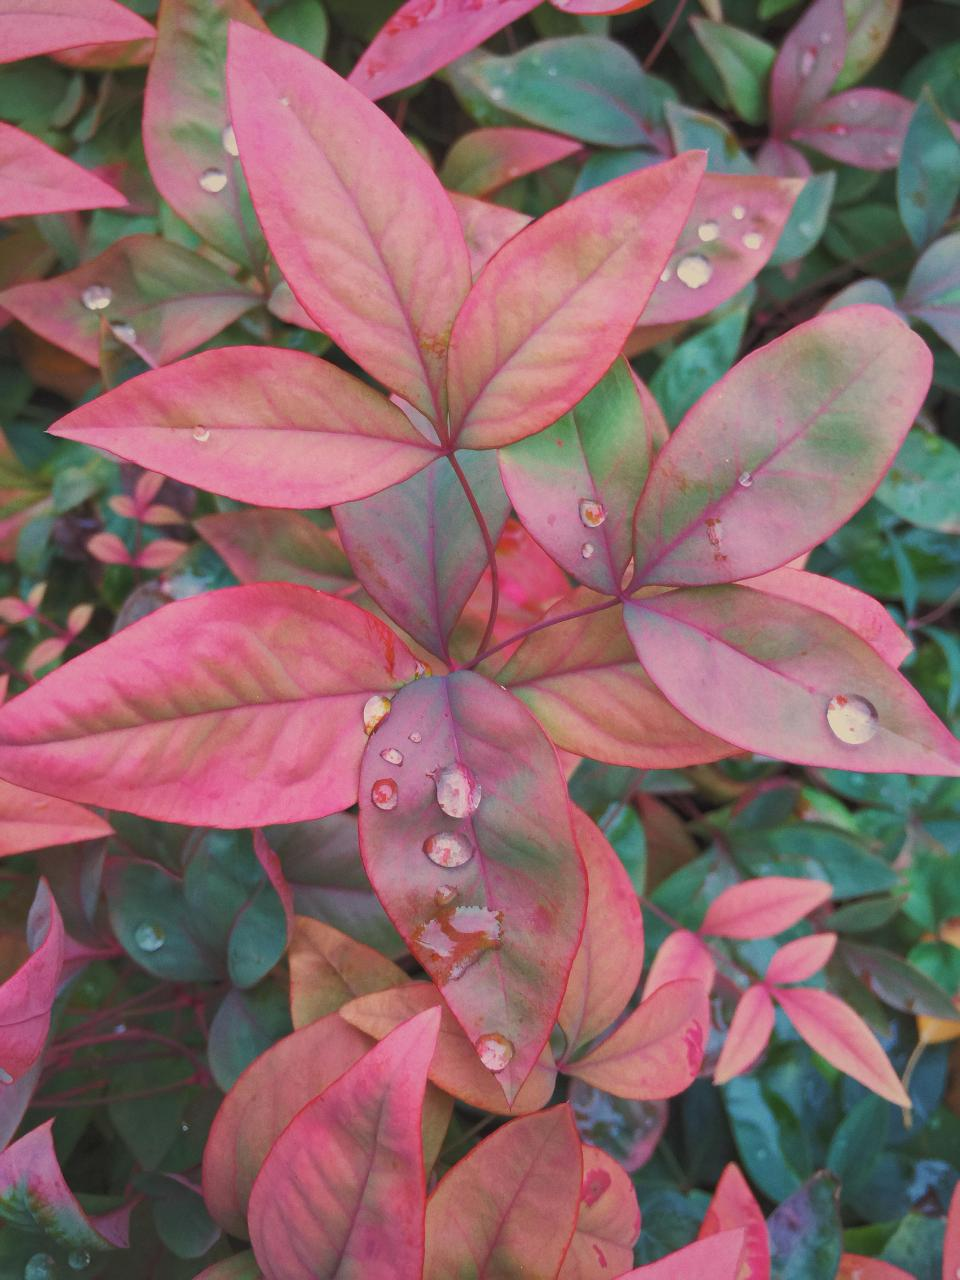 pink, flowers, garden, dew, nature